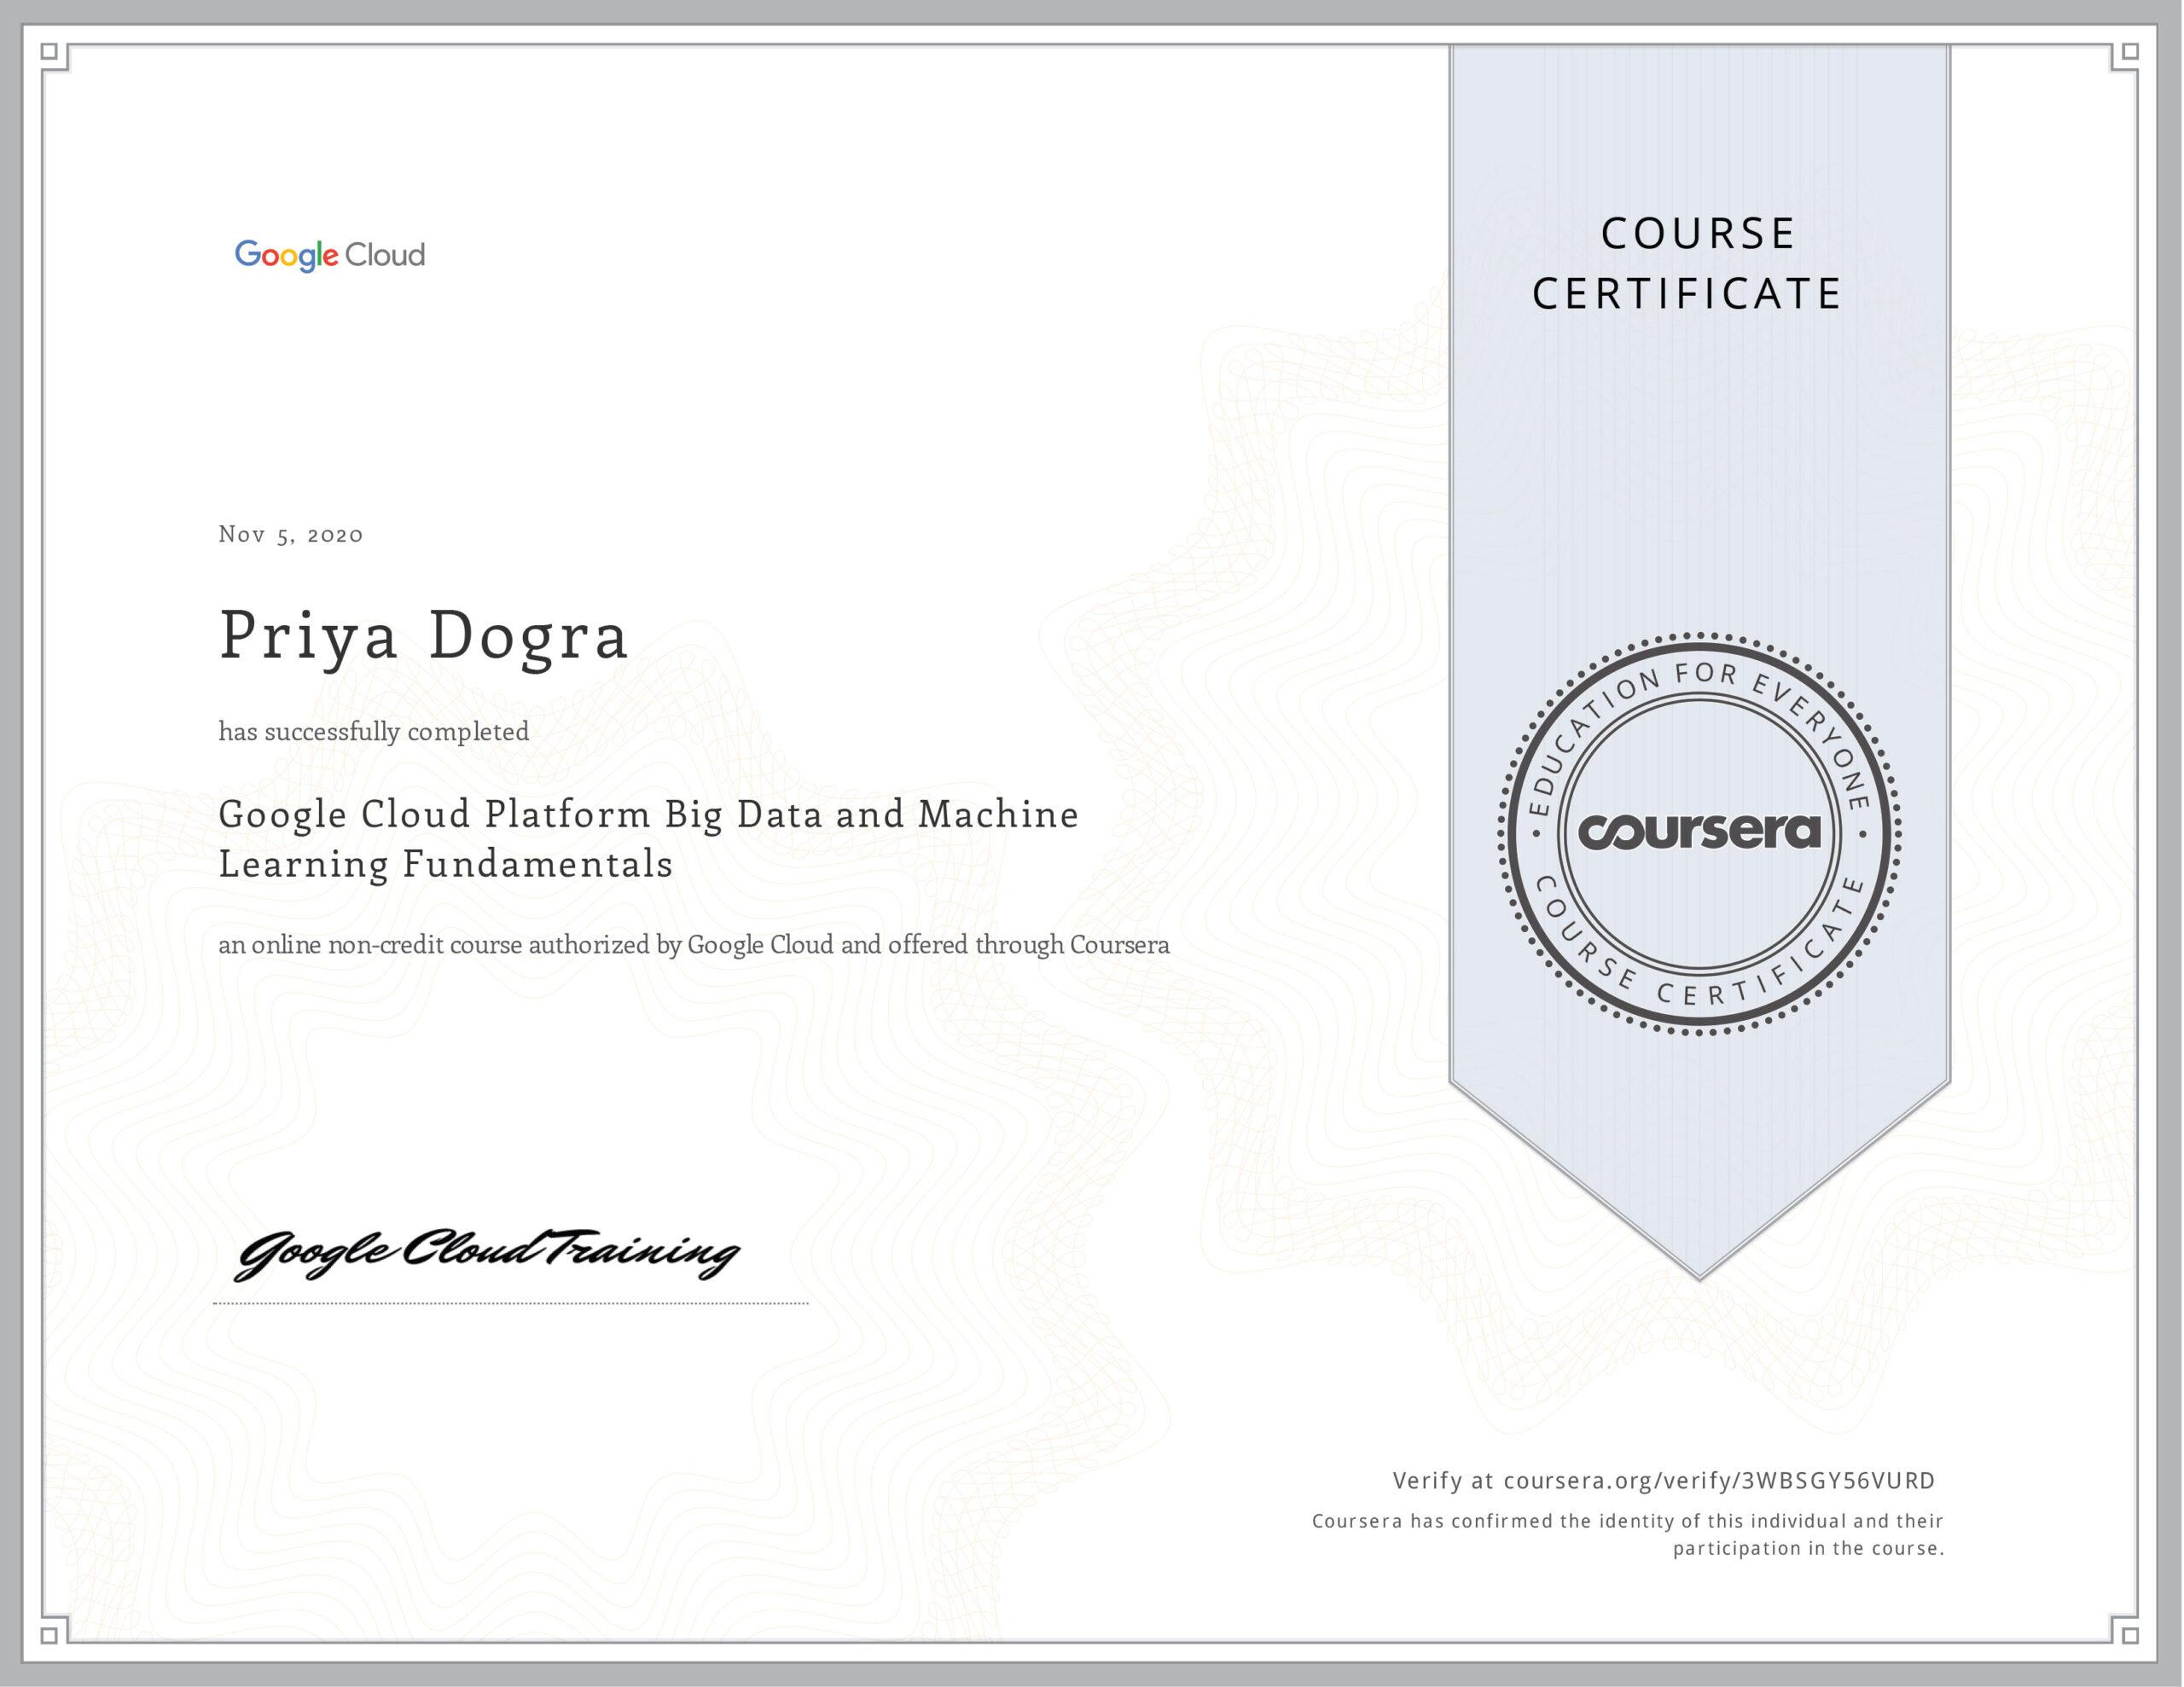 Google Cloud Professional Certificates on Coursera